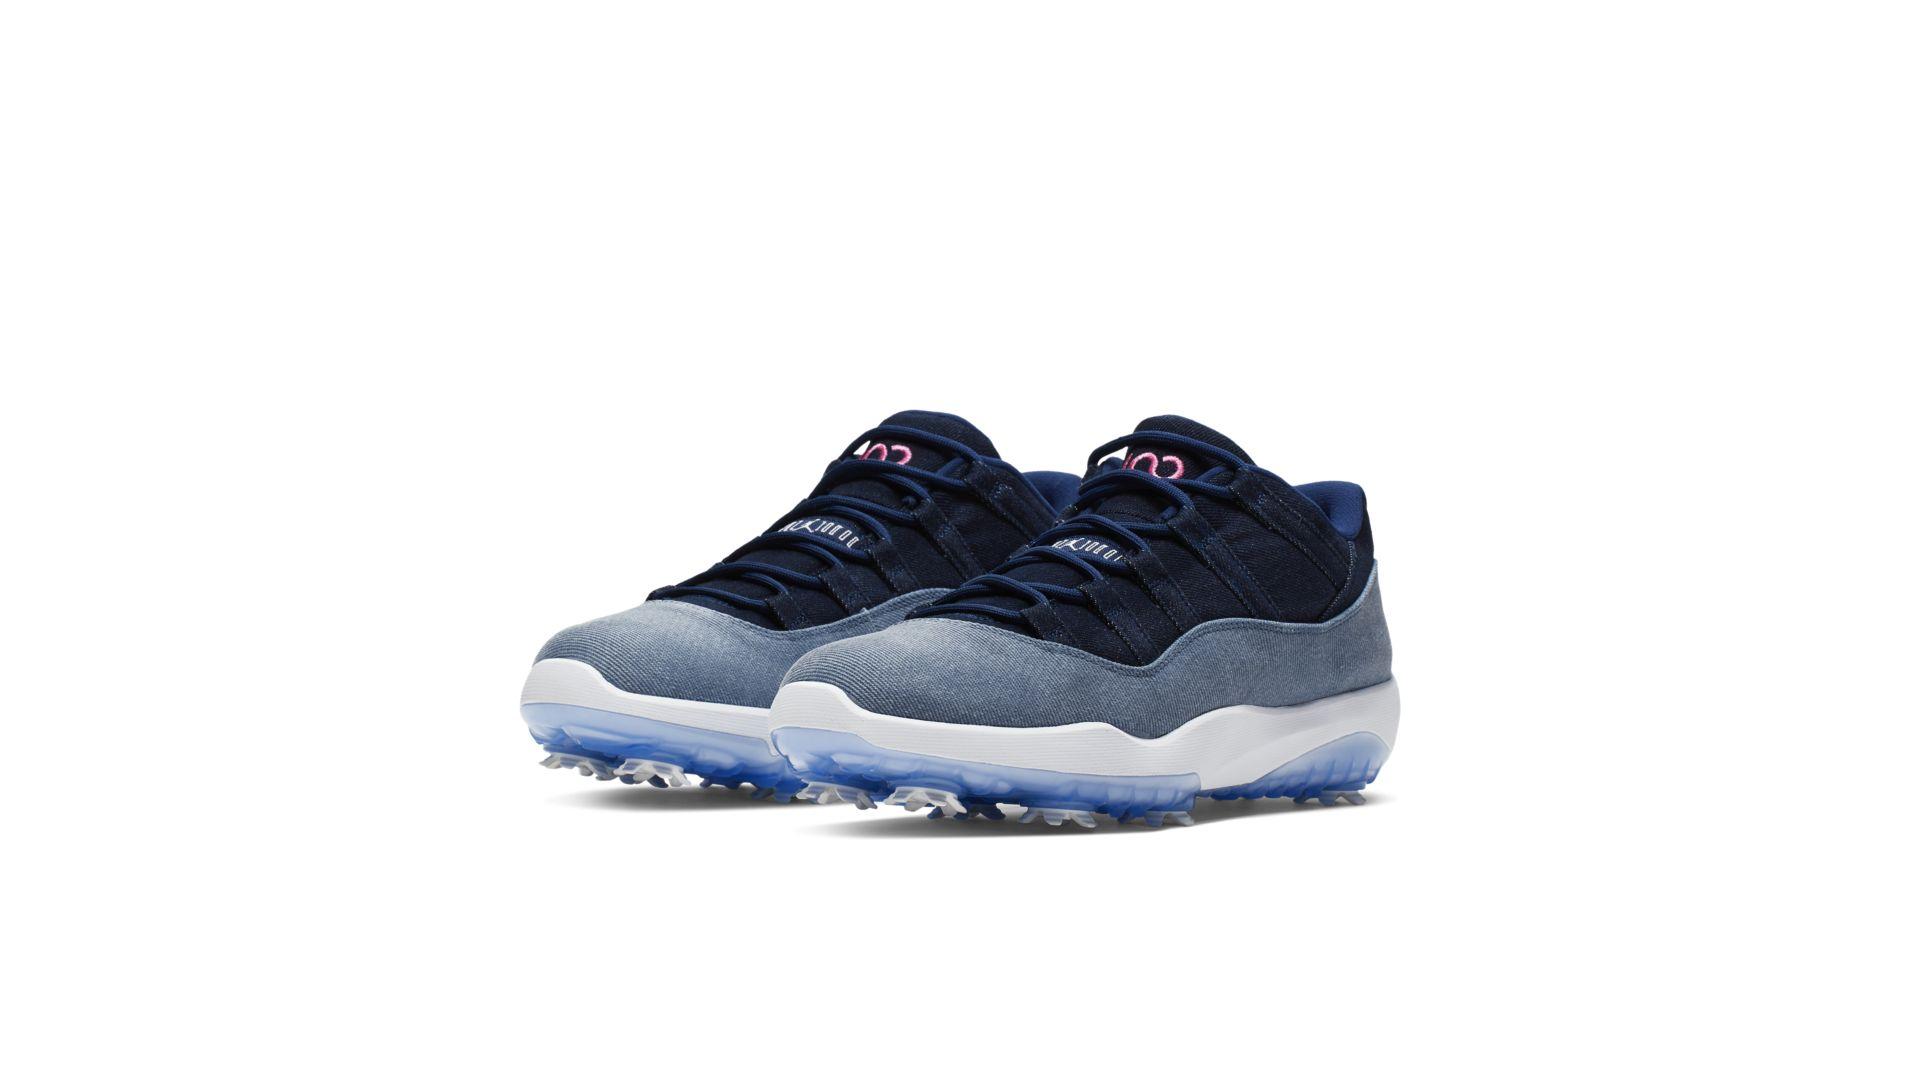 Jordan 11 Retro Low Golf No Denim Allowed (AQ0963-400)